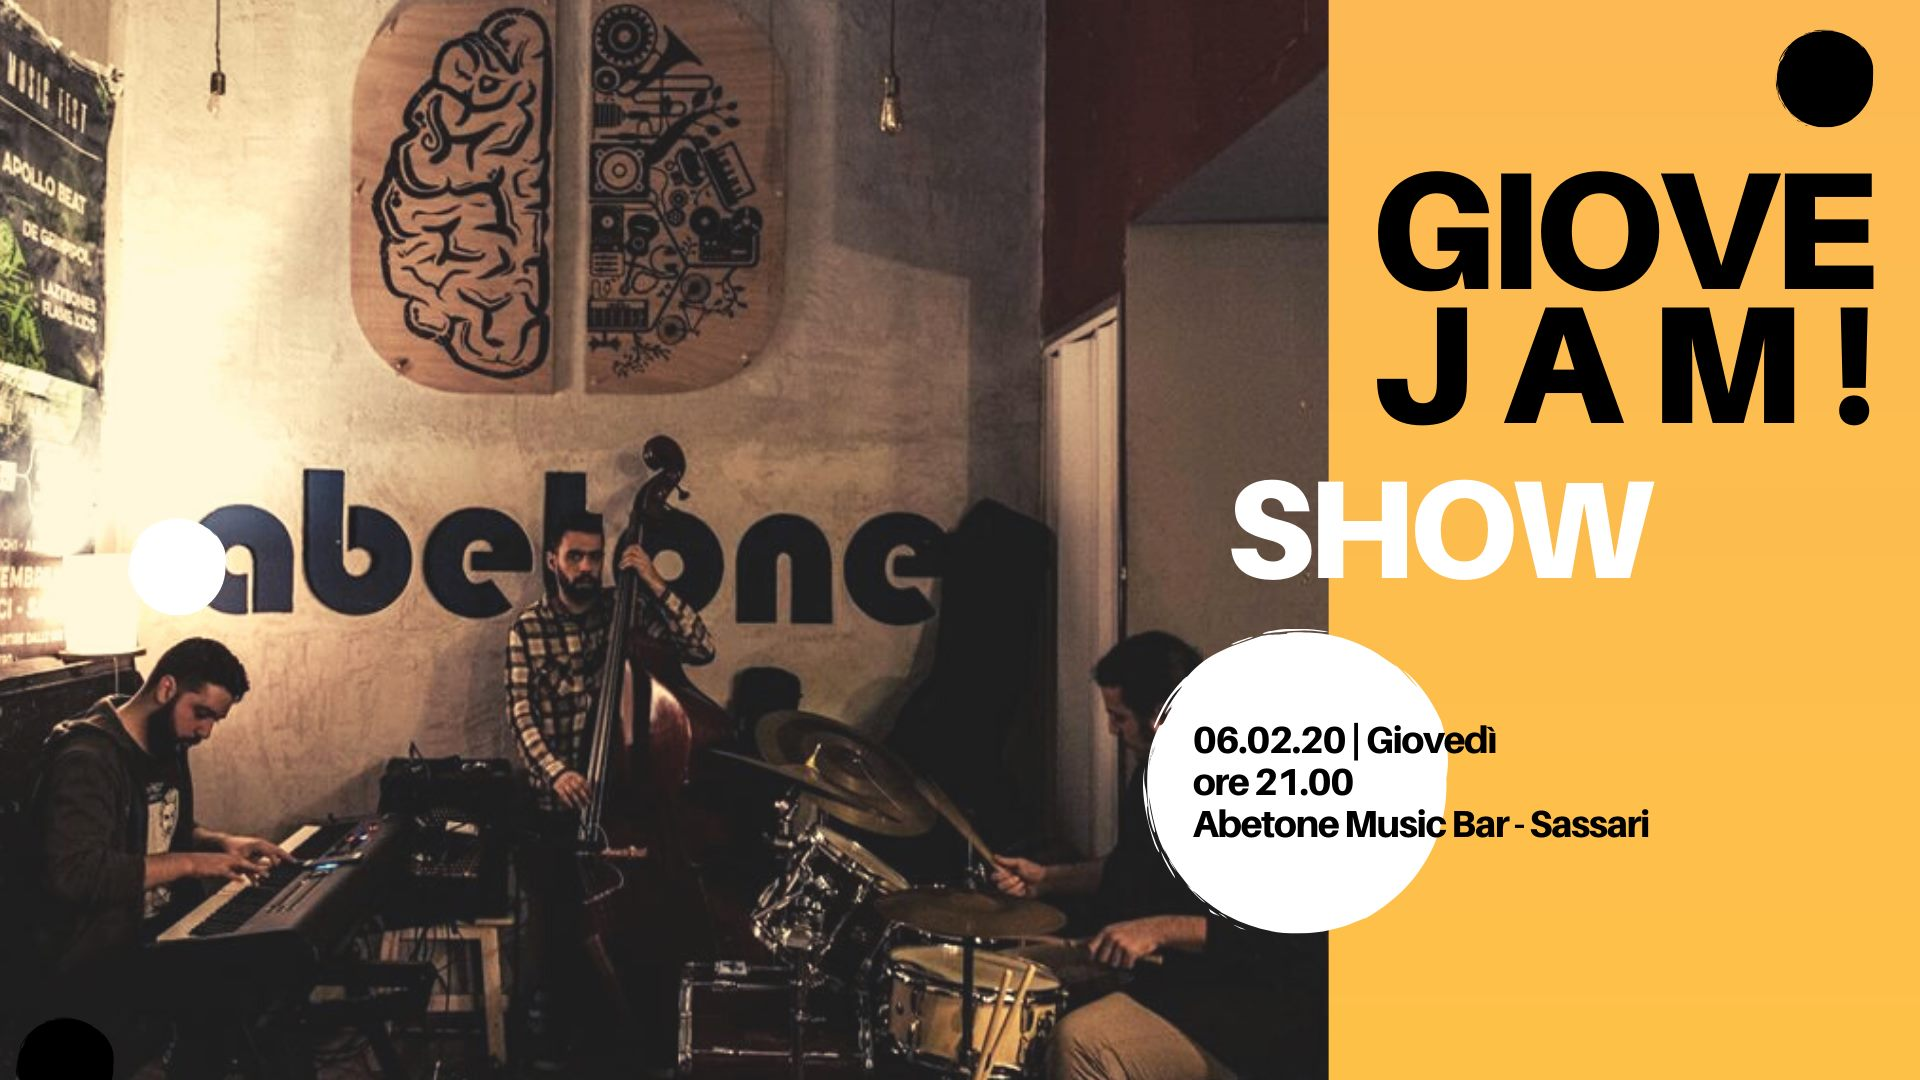 Giovejazz - GioveJam! - Abetone Music Bar - Sassari - 6 febbraio 2020 - eventi - 2020 - Sa Scena Sarda